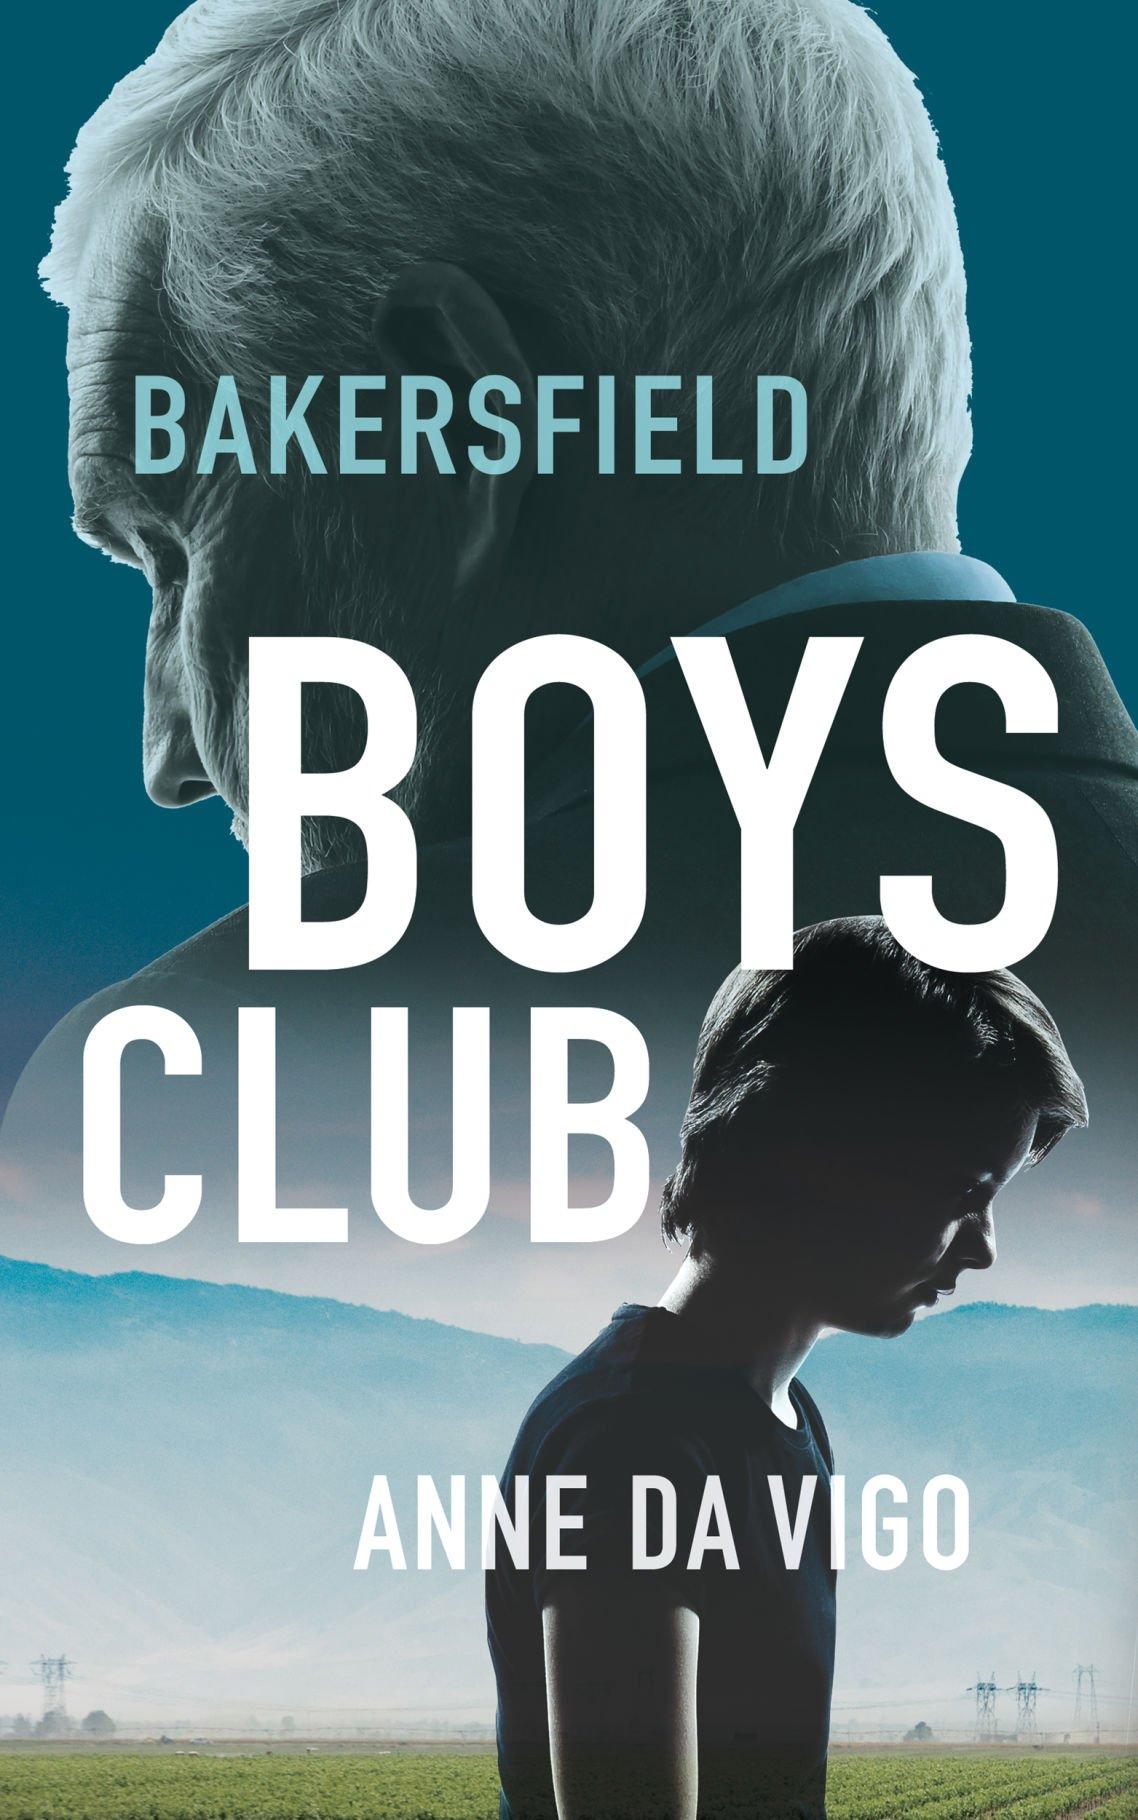 Bakersfield Boys e-book cover 1563x2500